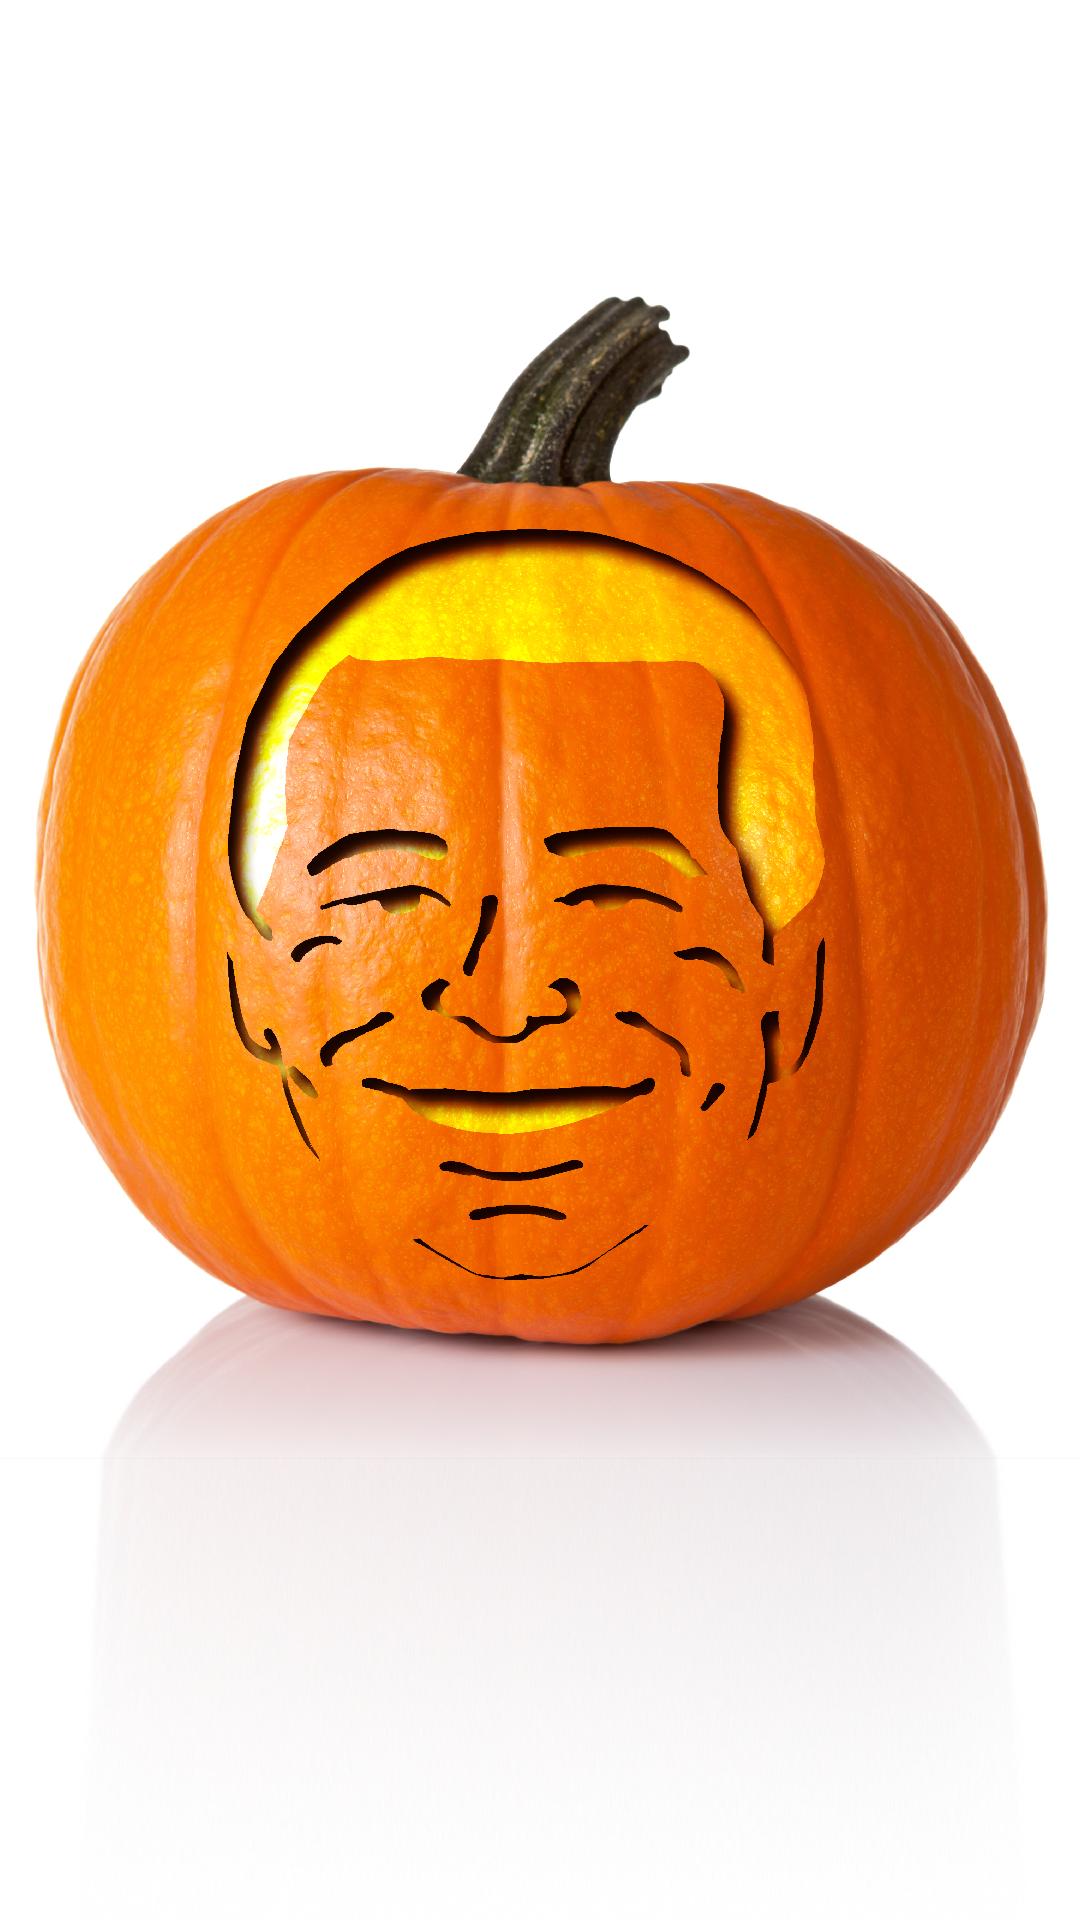 Phil Swift Pumpkin Stencil Official Site Flex Seal Family Of Products Pumpkin Carving Pumpkin Stencil Pumpkin Carvings Stencils